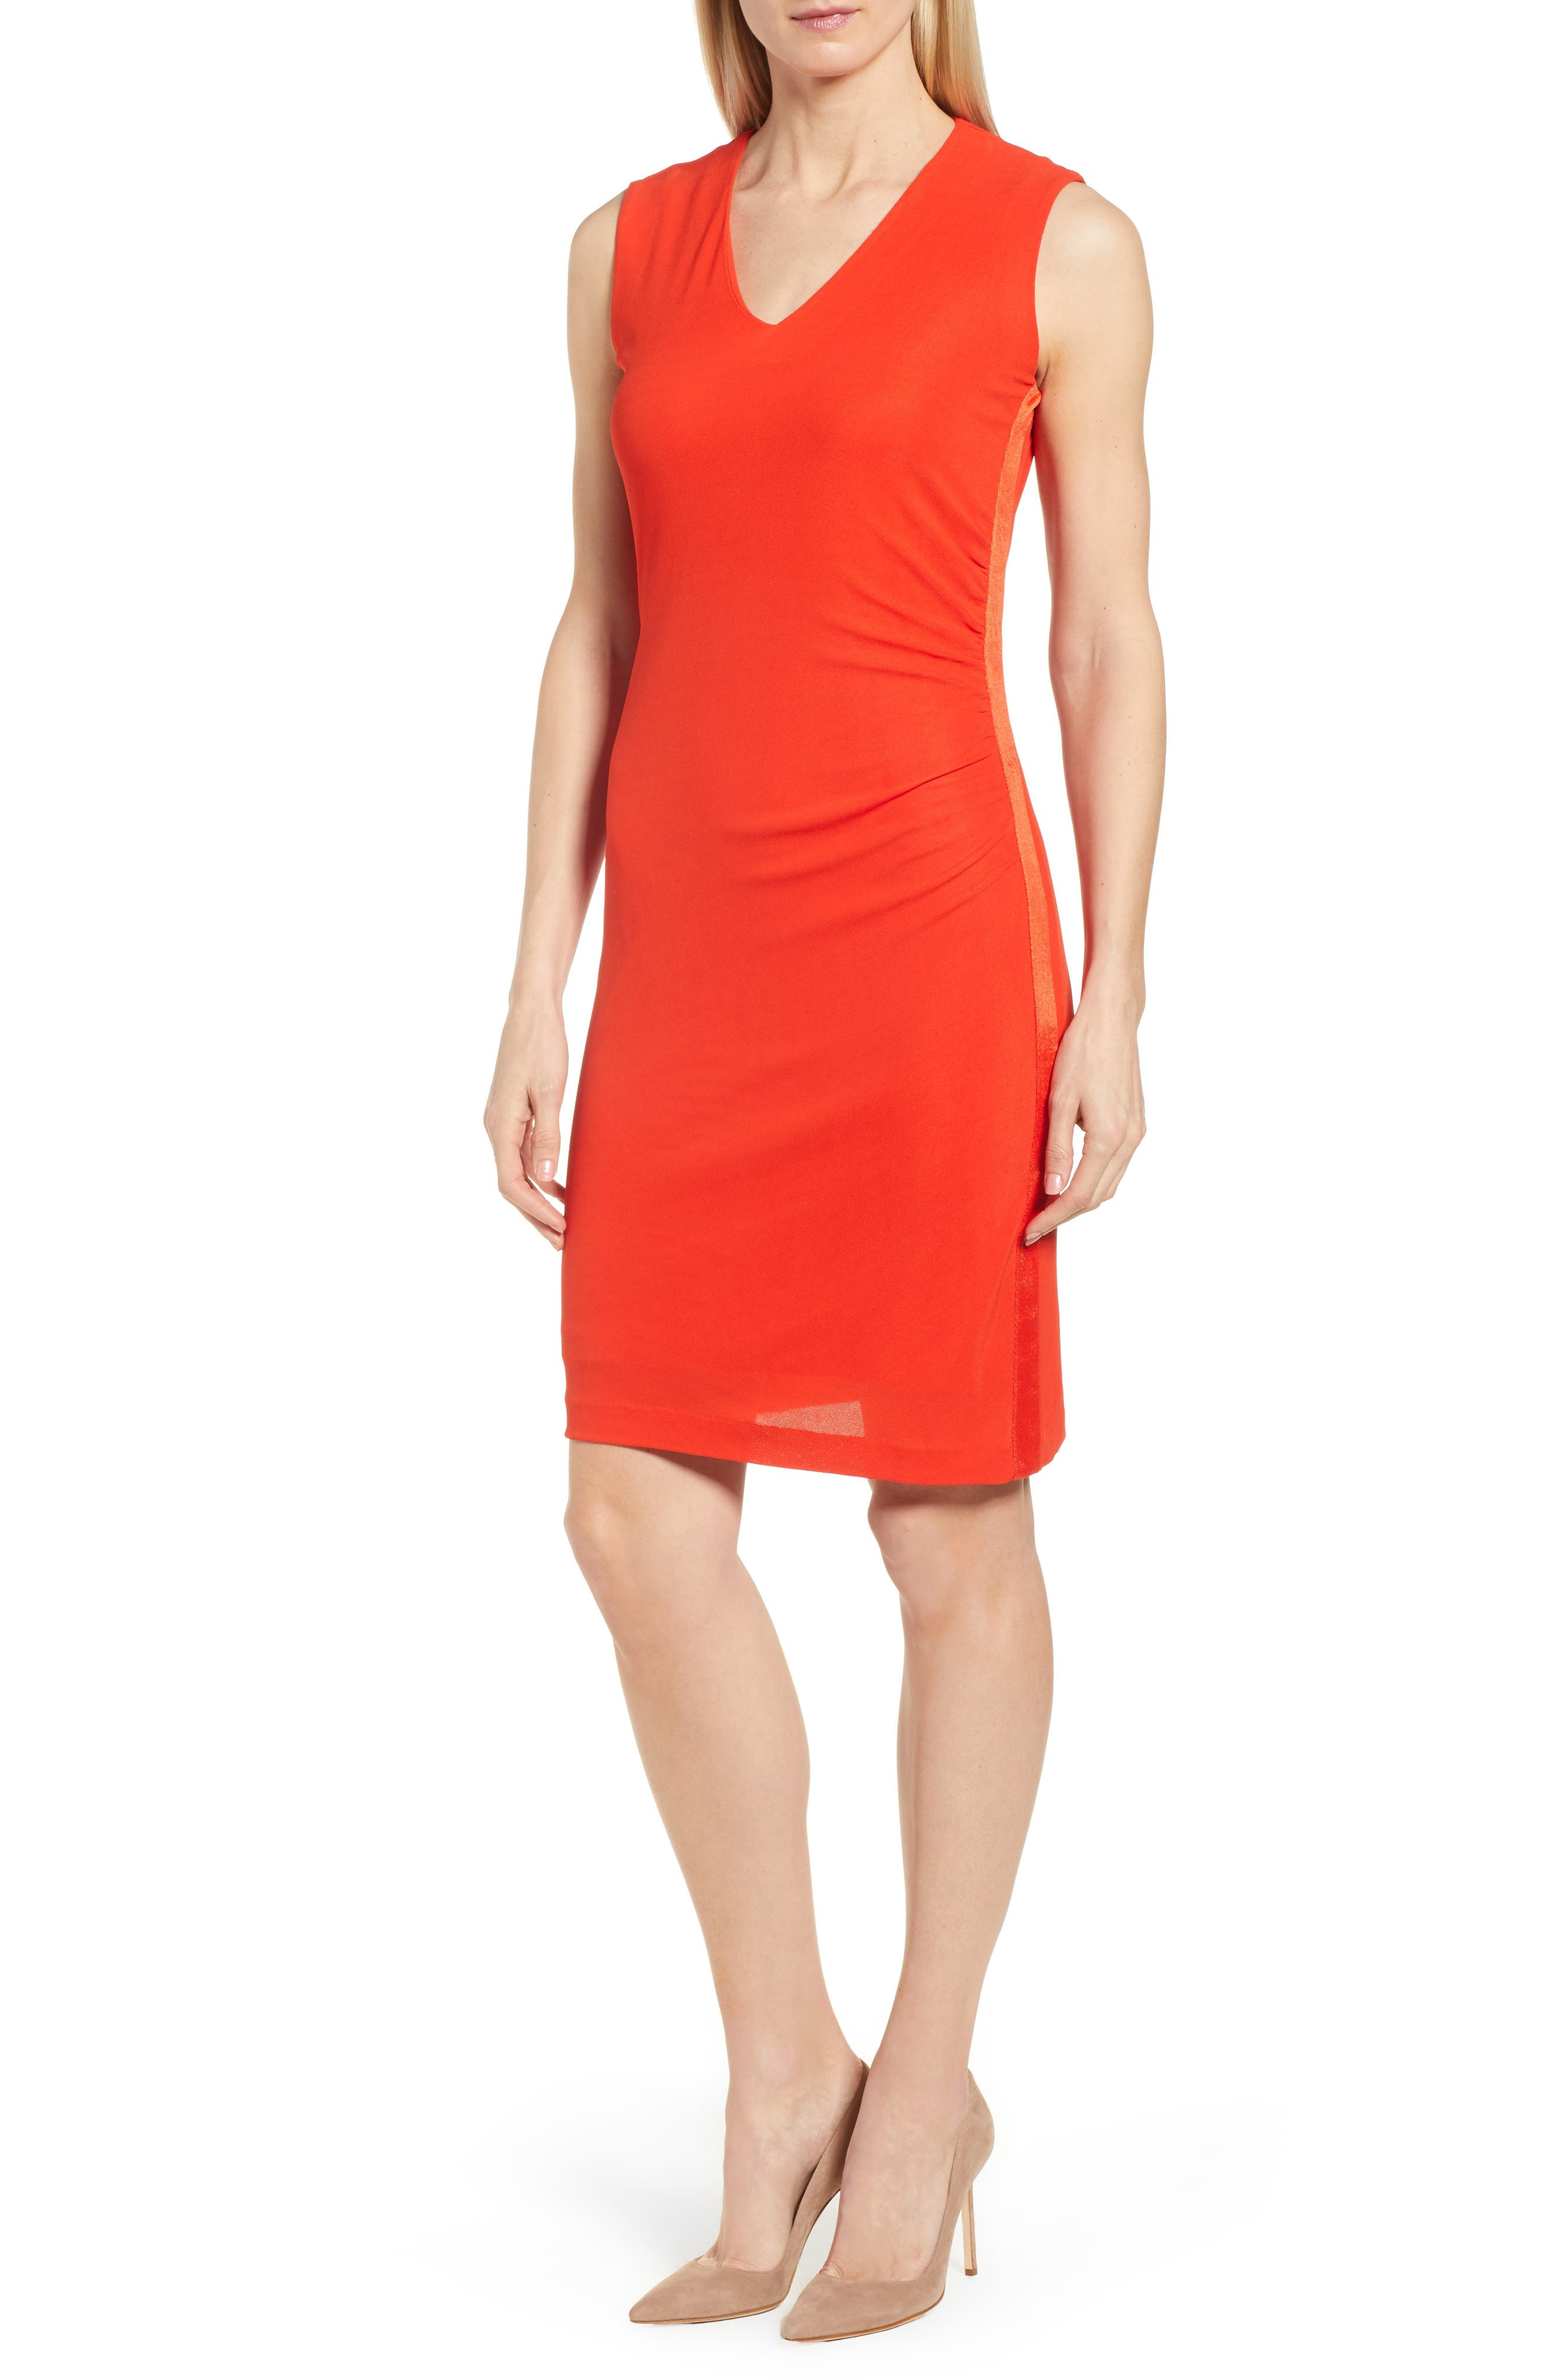 Erela Ruched Sheath Dress,                         Main,                         color, 824